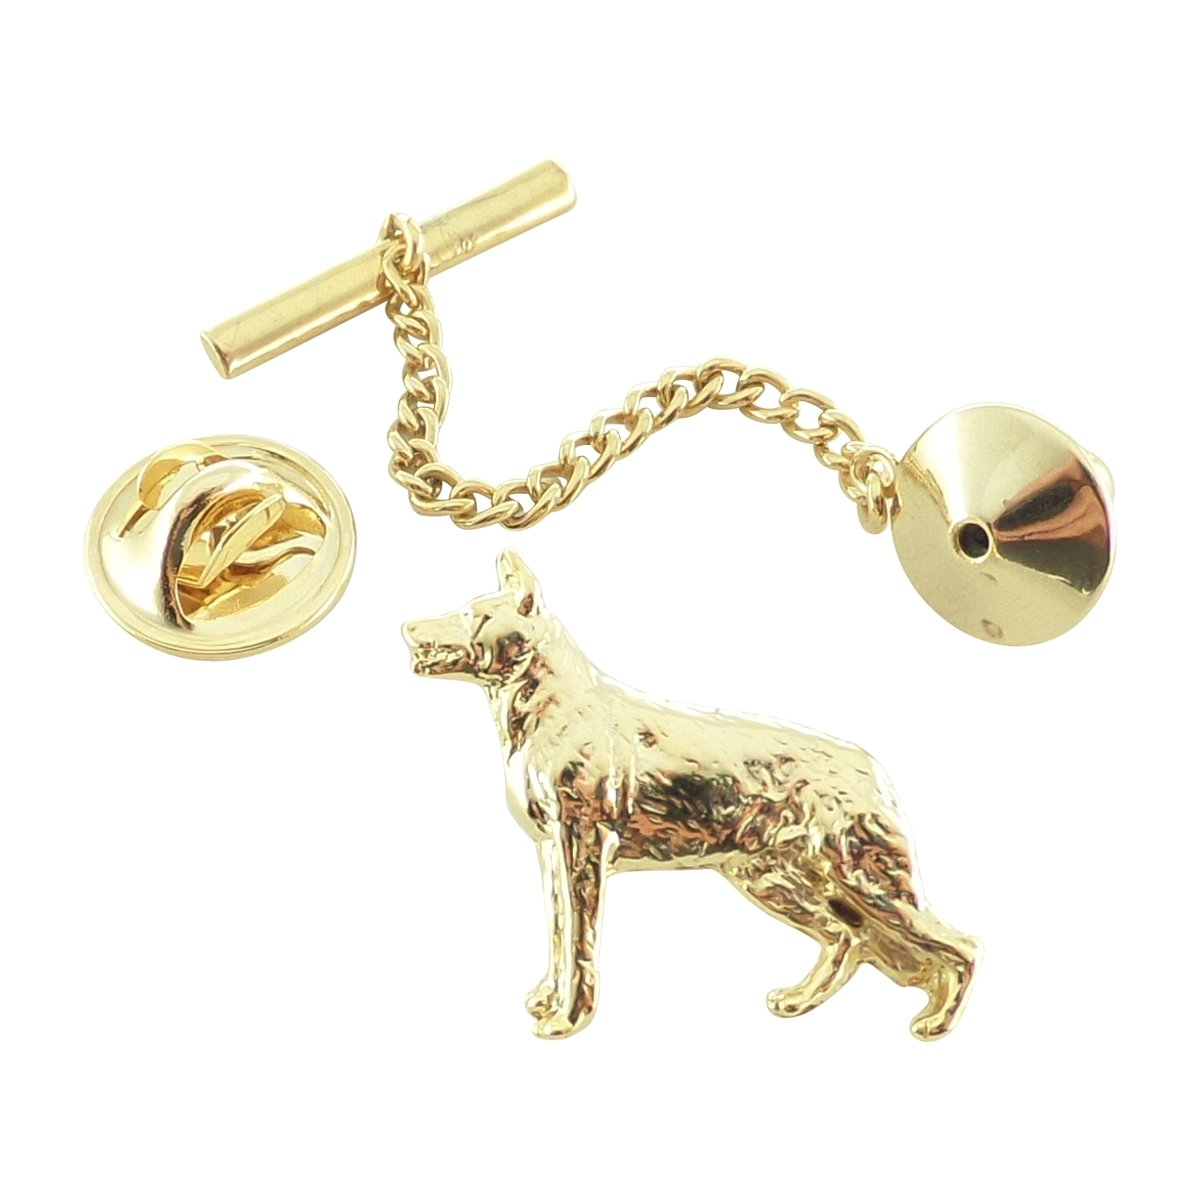 Creative Pewter Designs, Pewter German Shepherd Tie Tack, Gold Plated, DG384TT by Creative Pewter Designs (Image #1)